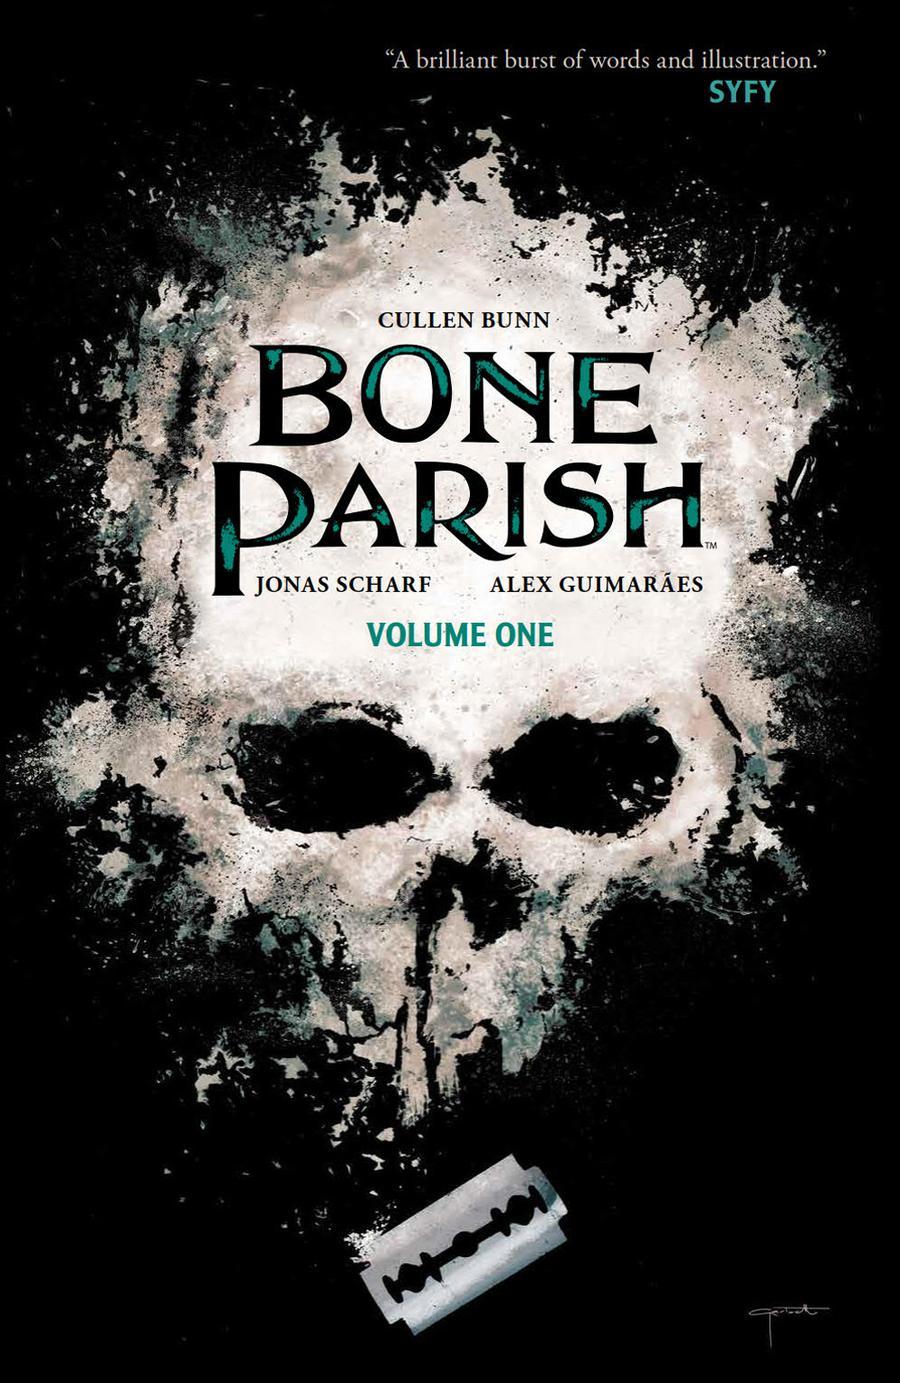 Bone Parish Vol 1 TP